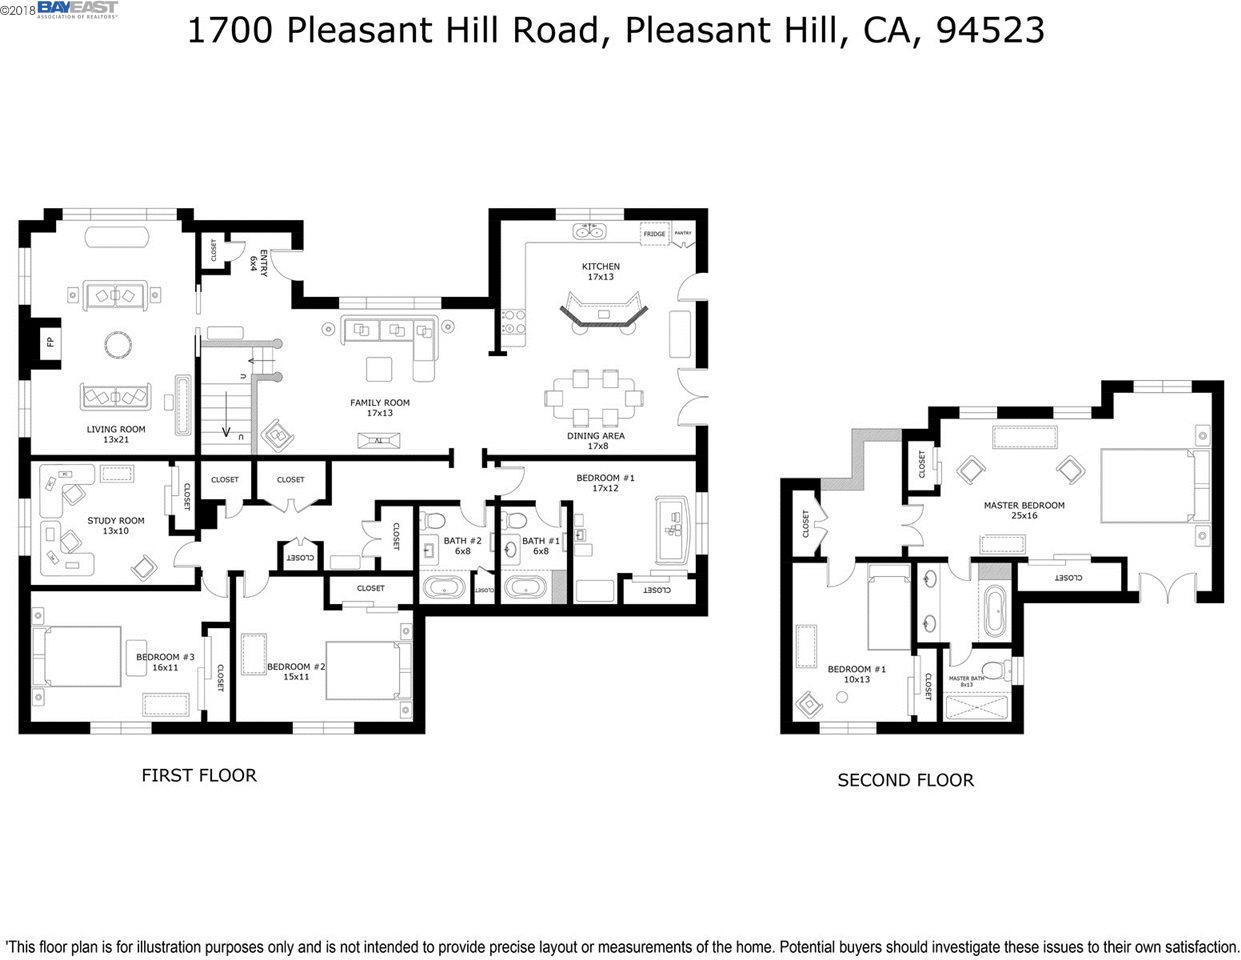 1700 PLEASANT HILL RD, PLEASANT HILL, CA 94523  Photo